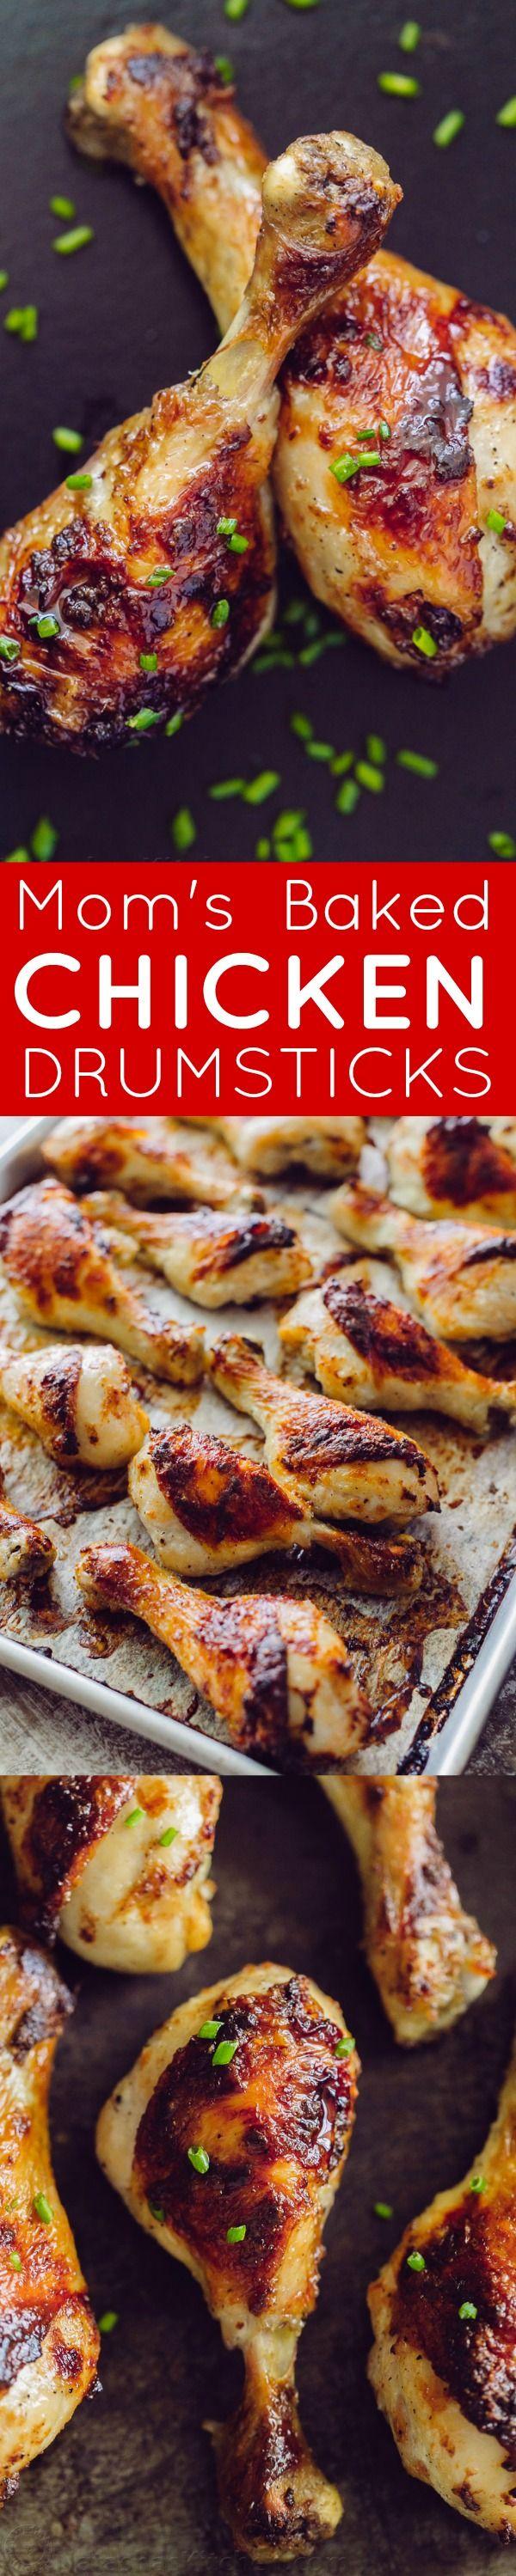 Tender, juicy baked chicken drumsticks with a crisp, salty skin. Marinade has only 4 ingredients. Mom's method makes these chicken drumsticks finger-lickin' good! | natashaskitchen.com